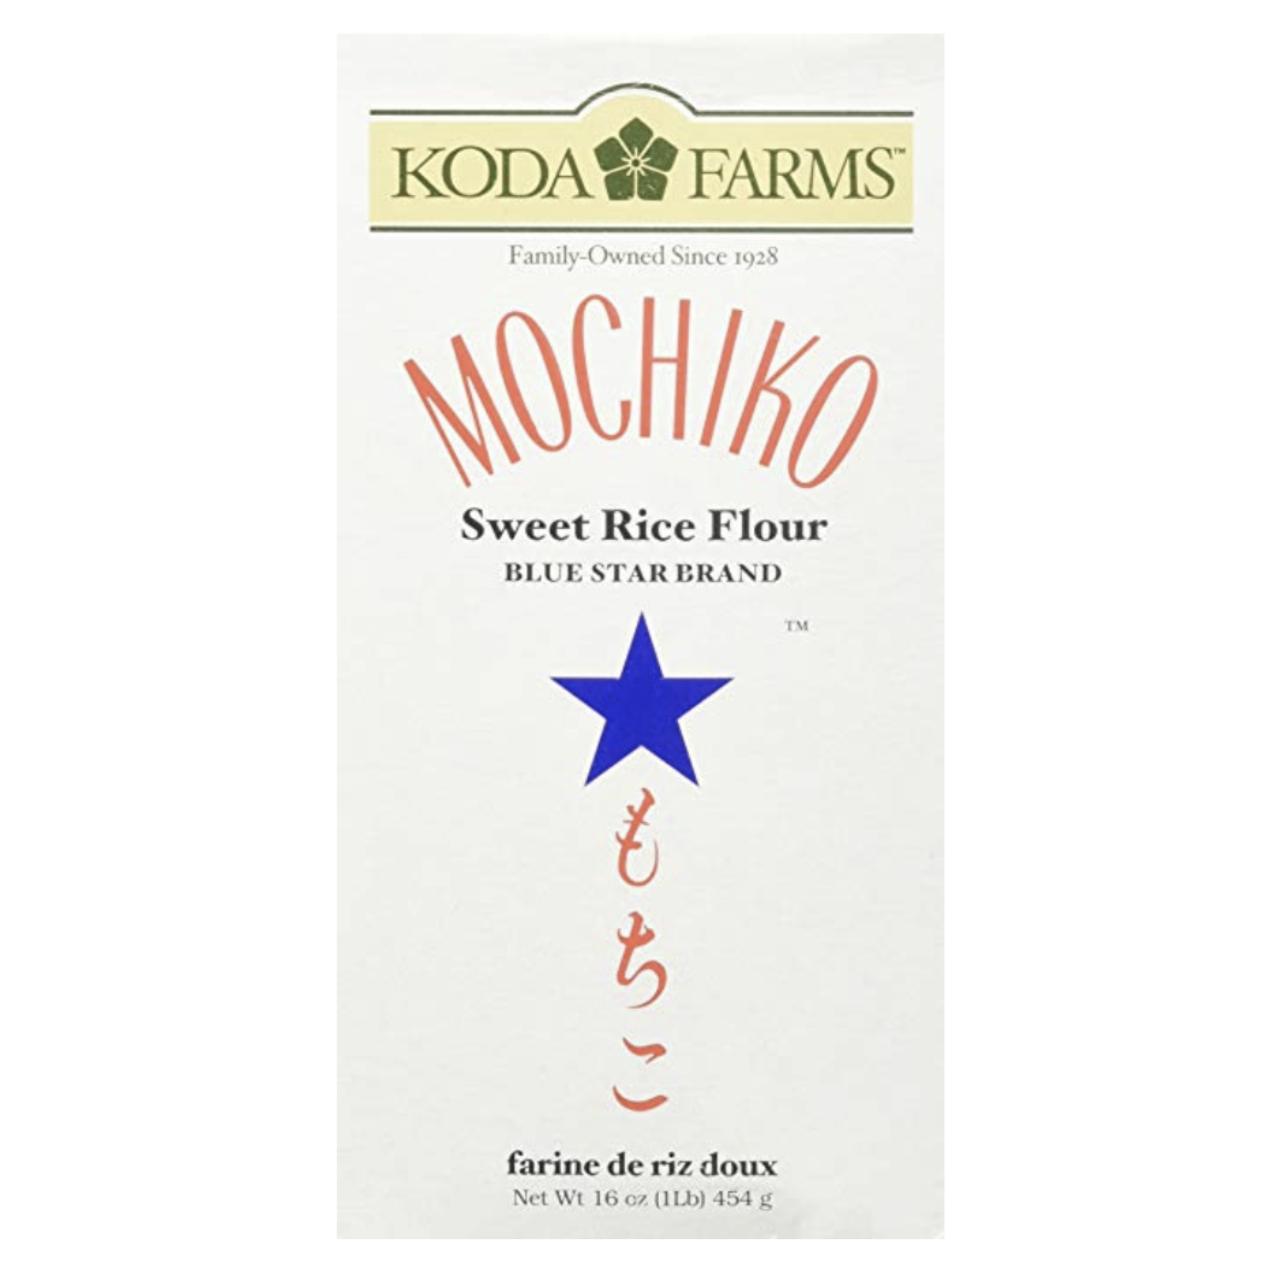 Mochiko - Sweet Rice Flour